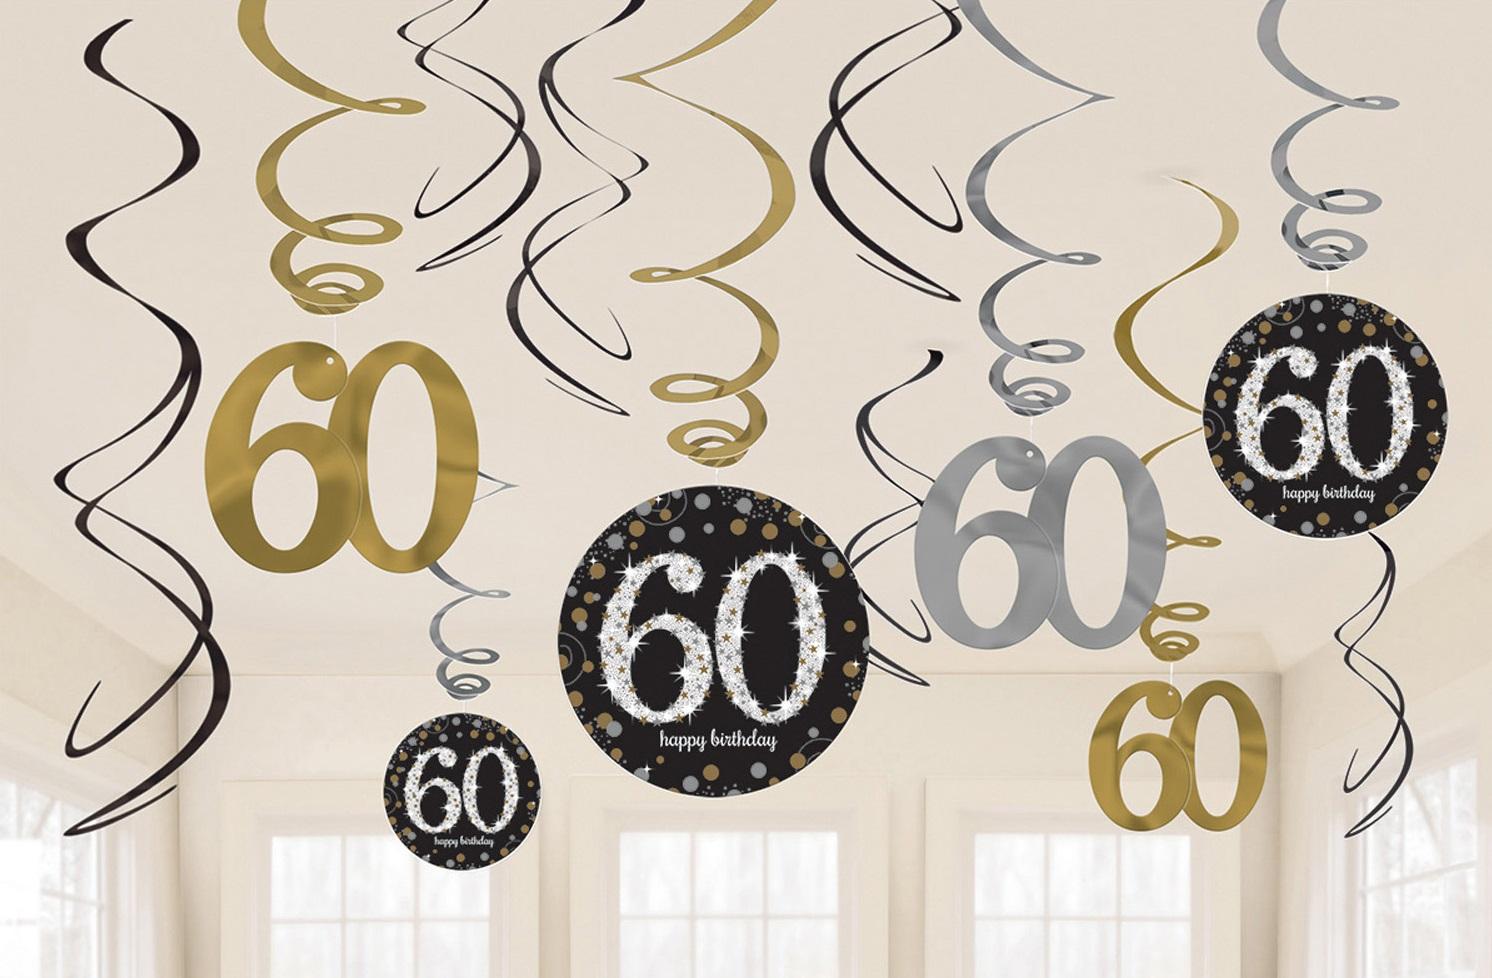 Amscan Dekorácia Víry 60. narodeniny - Trblietavá zlatá